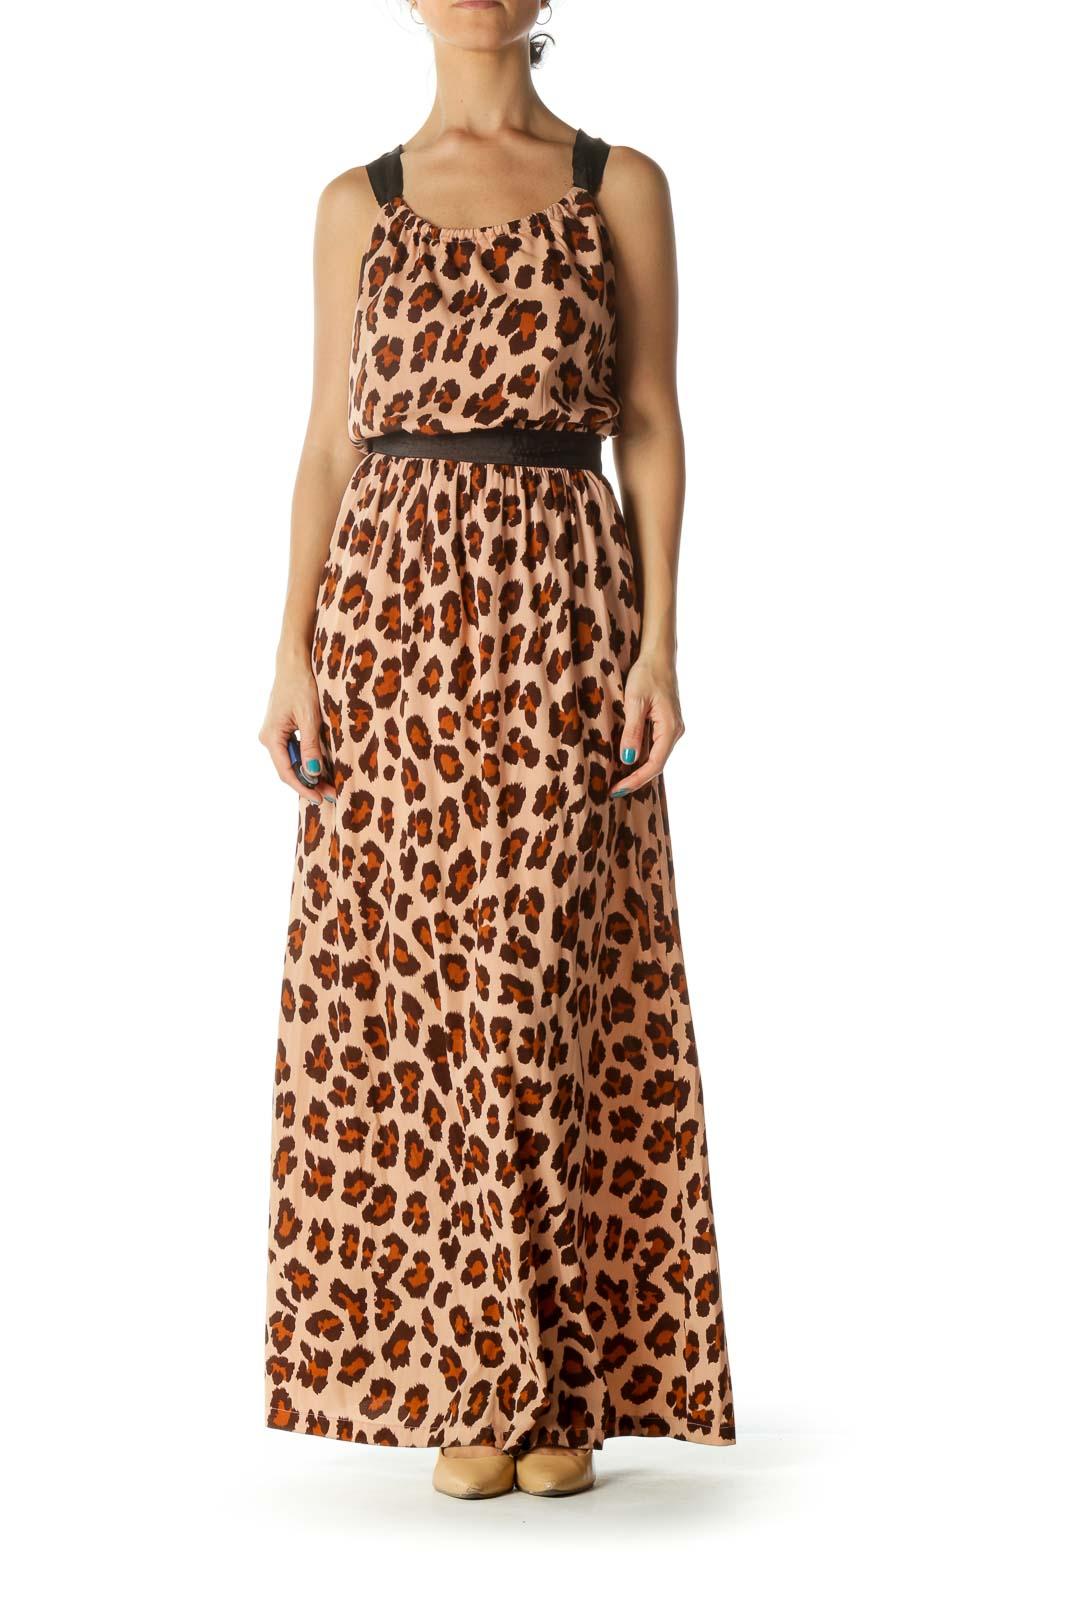 Brown and Orange Animal Print Maxi Dress